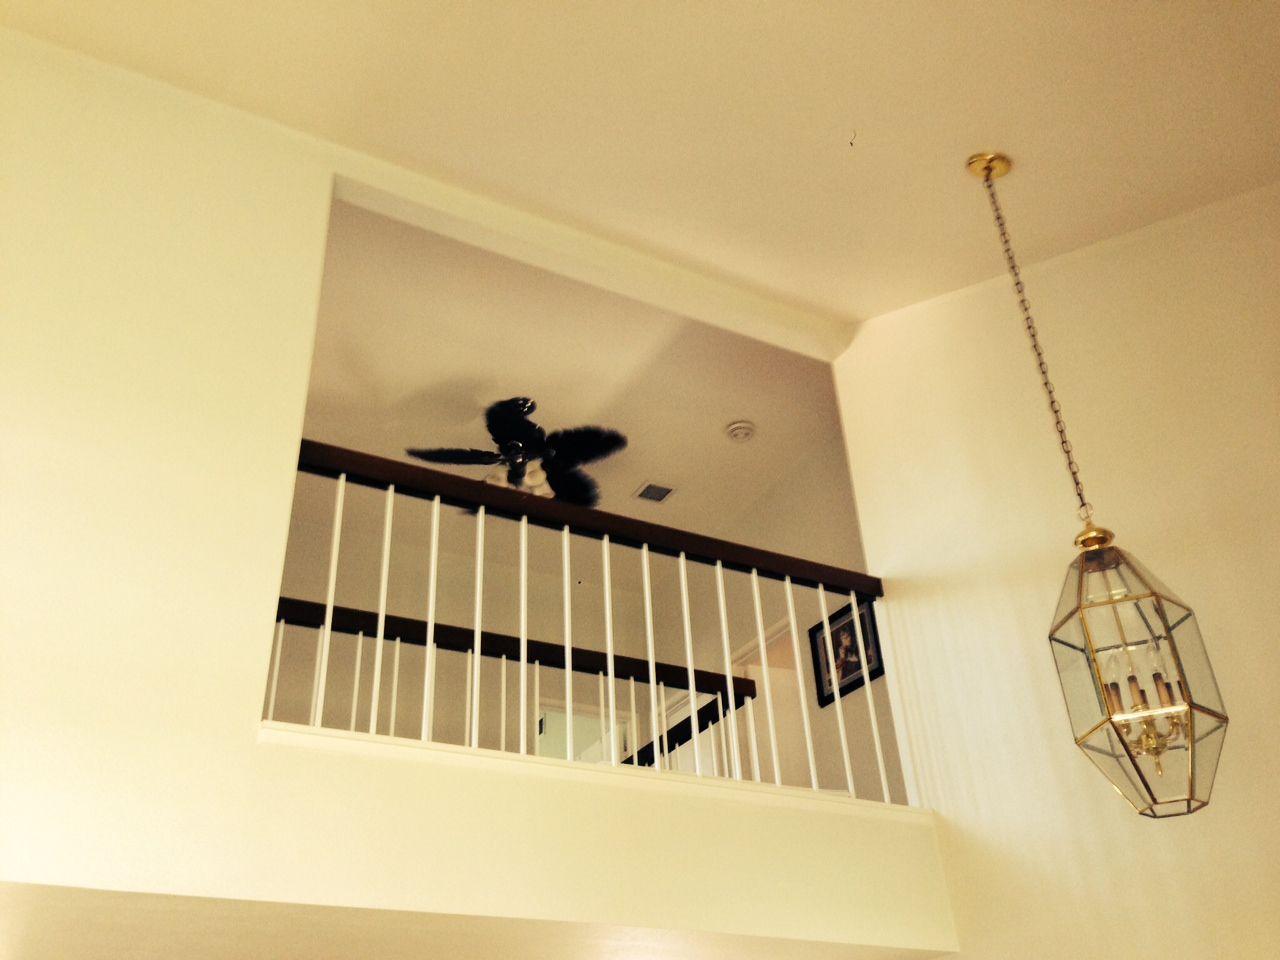 Vaulted ceilings  ~ Sheryl Lynn Johnson  (805) 907-8270 SherylLynn@ConnectingHeartsToHomes.com CalBRE #01446902